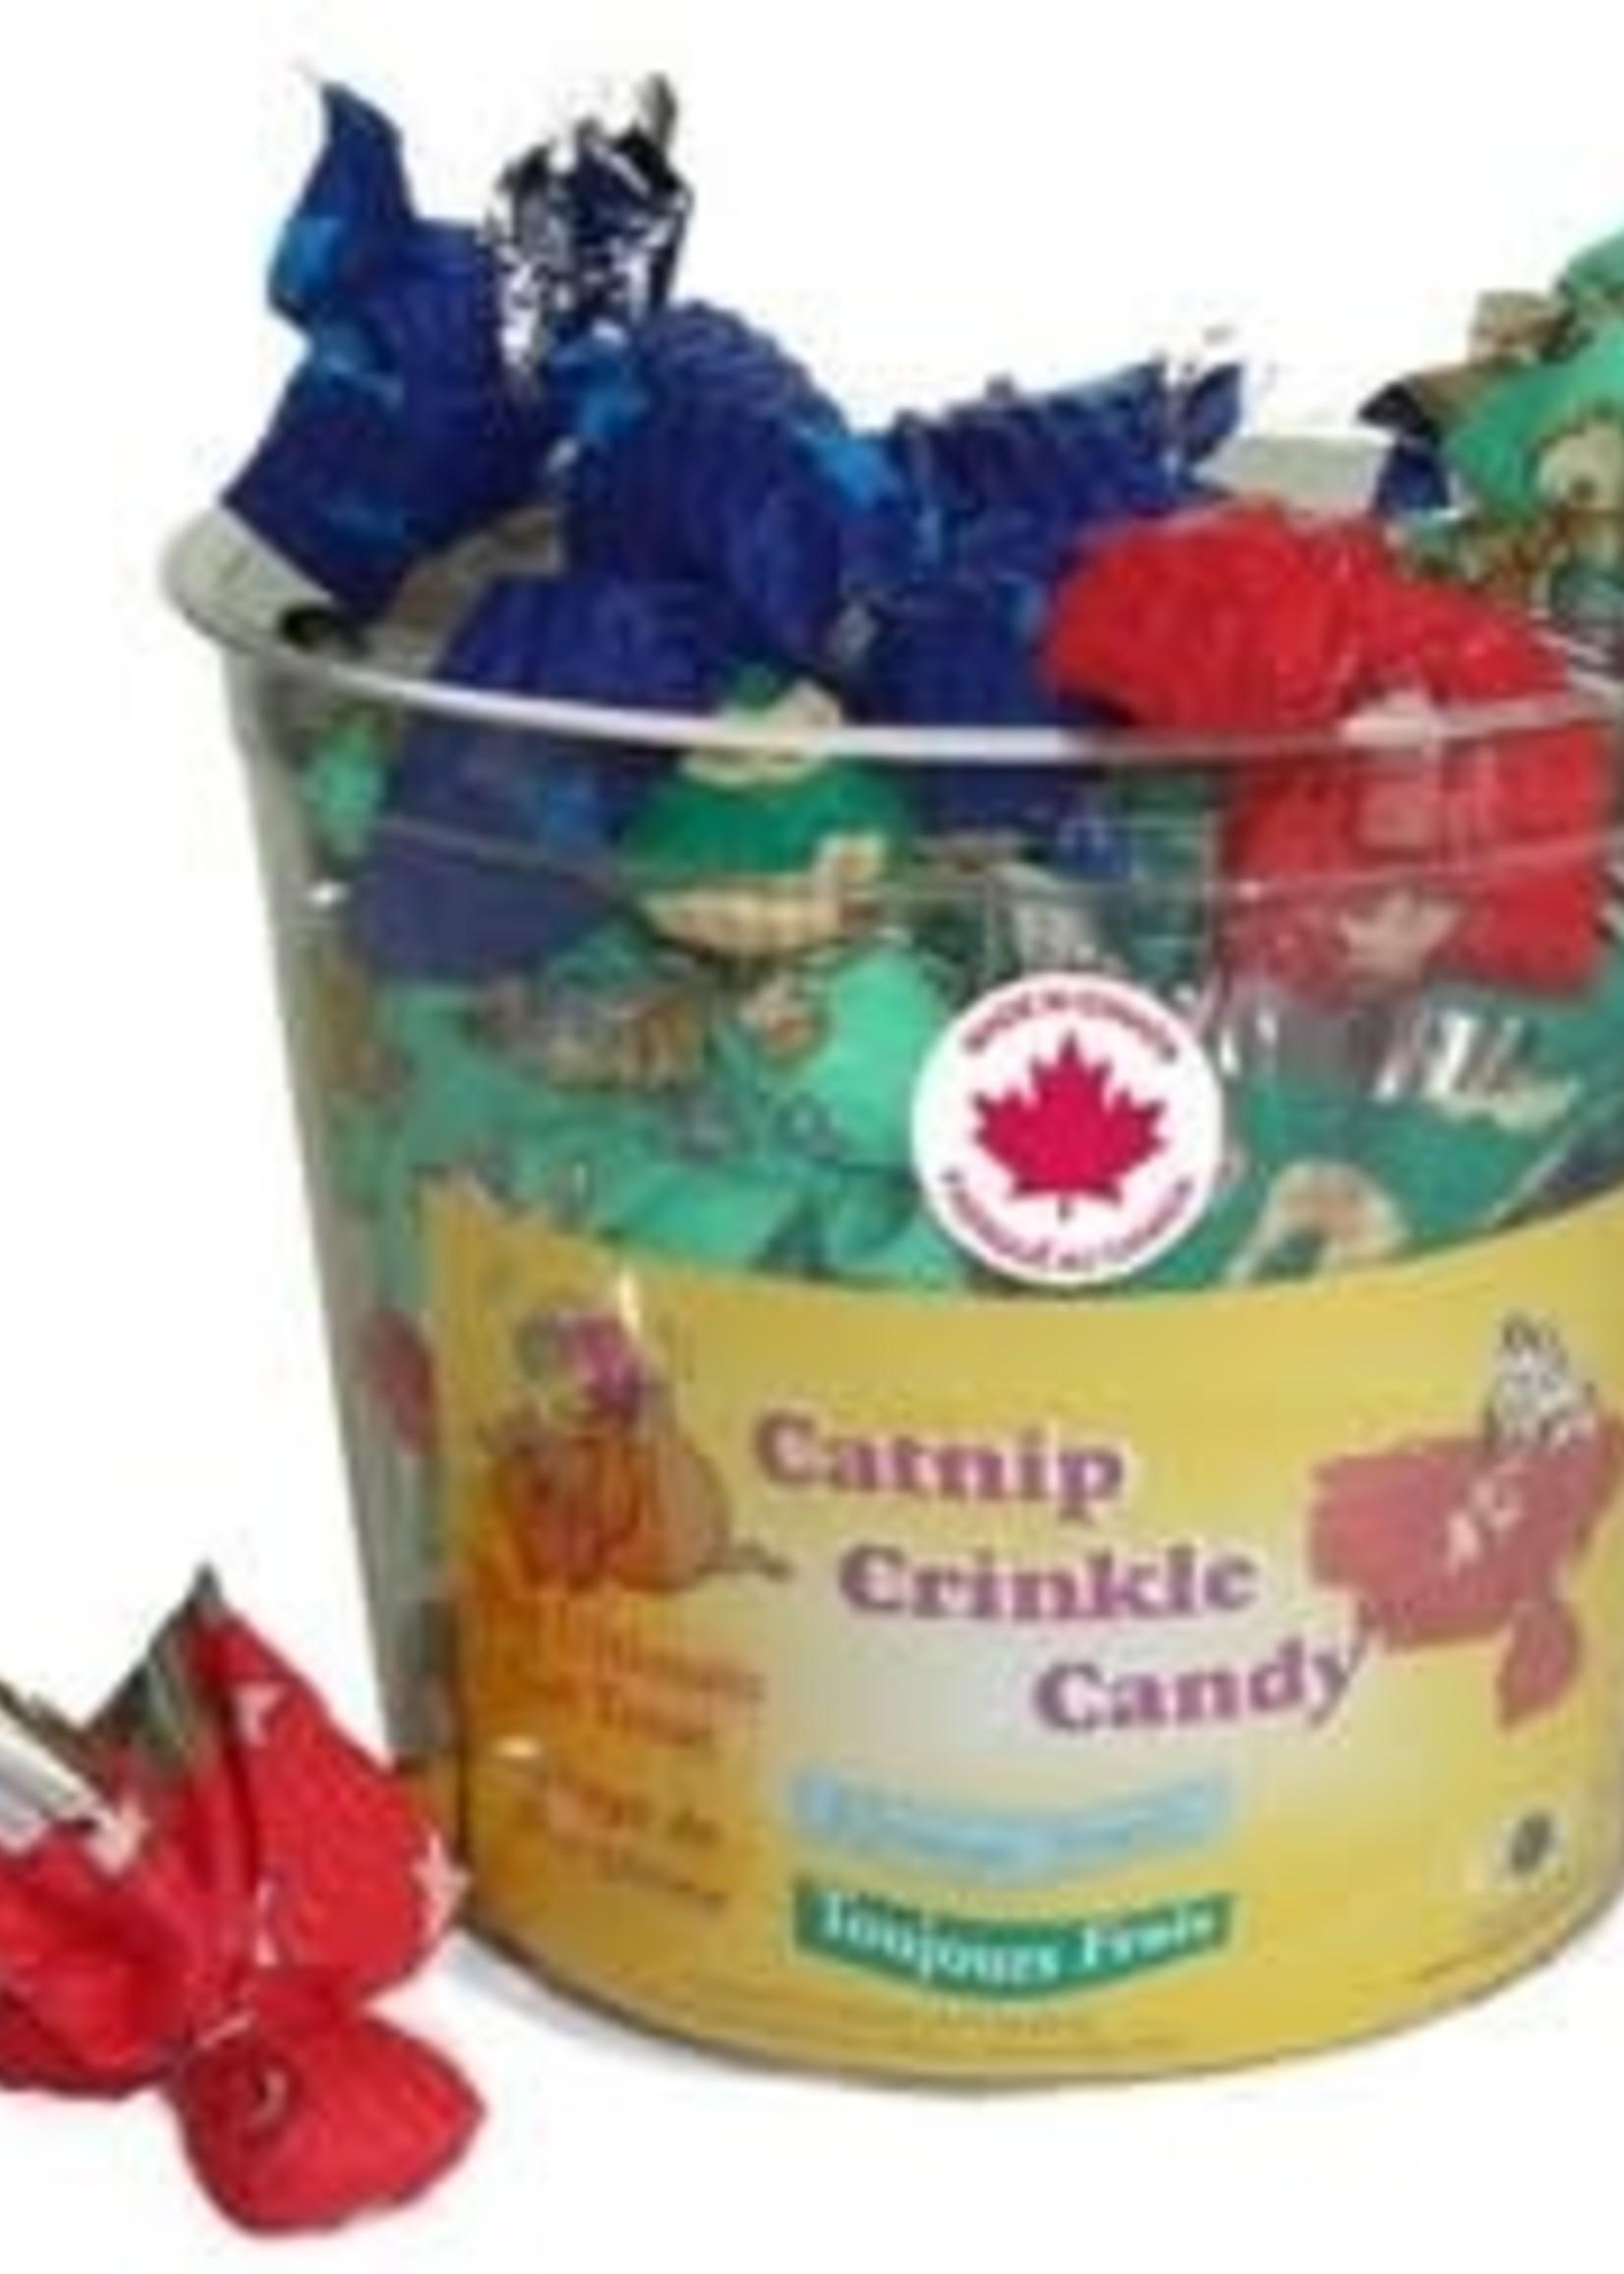 CanCor® Catnip Crinkle Candy